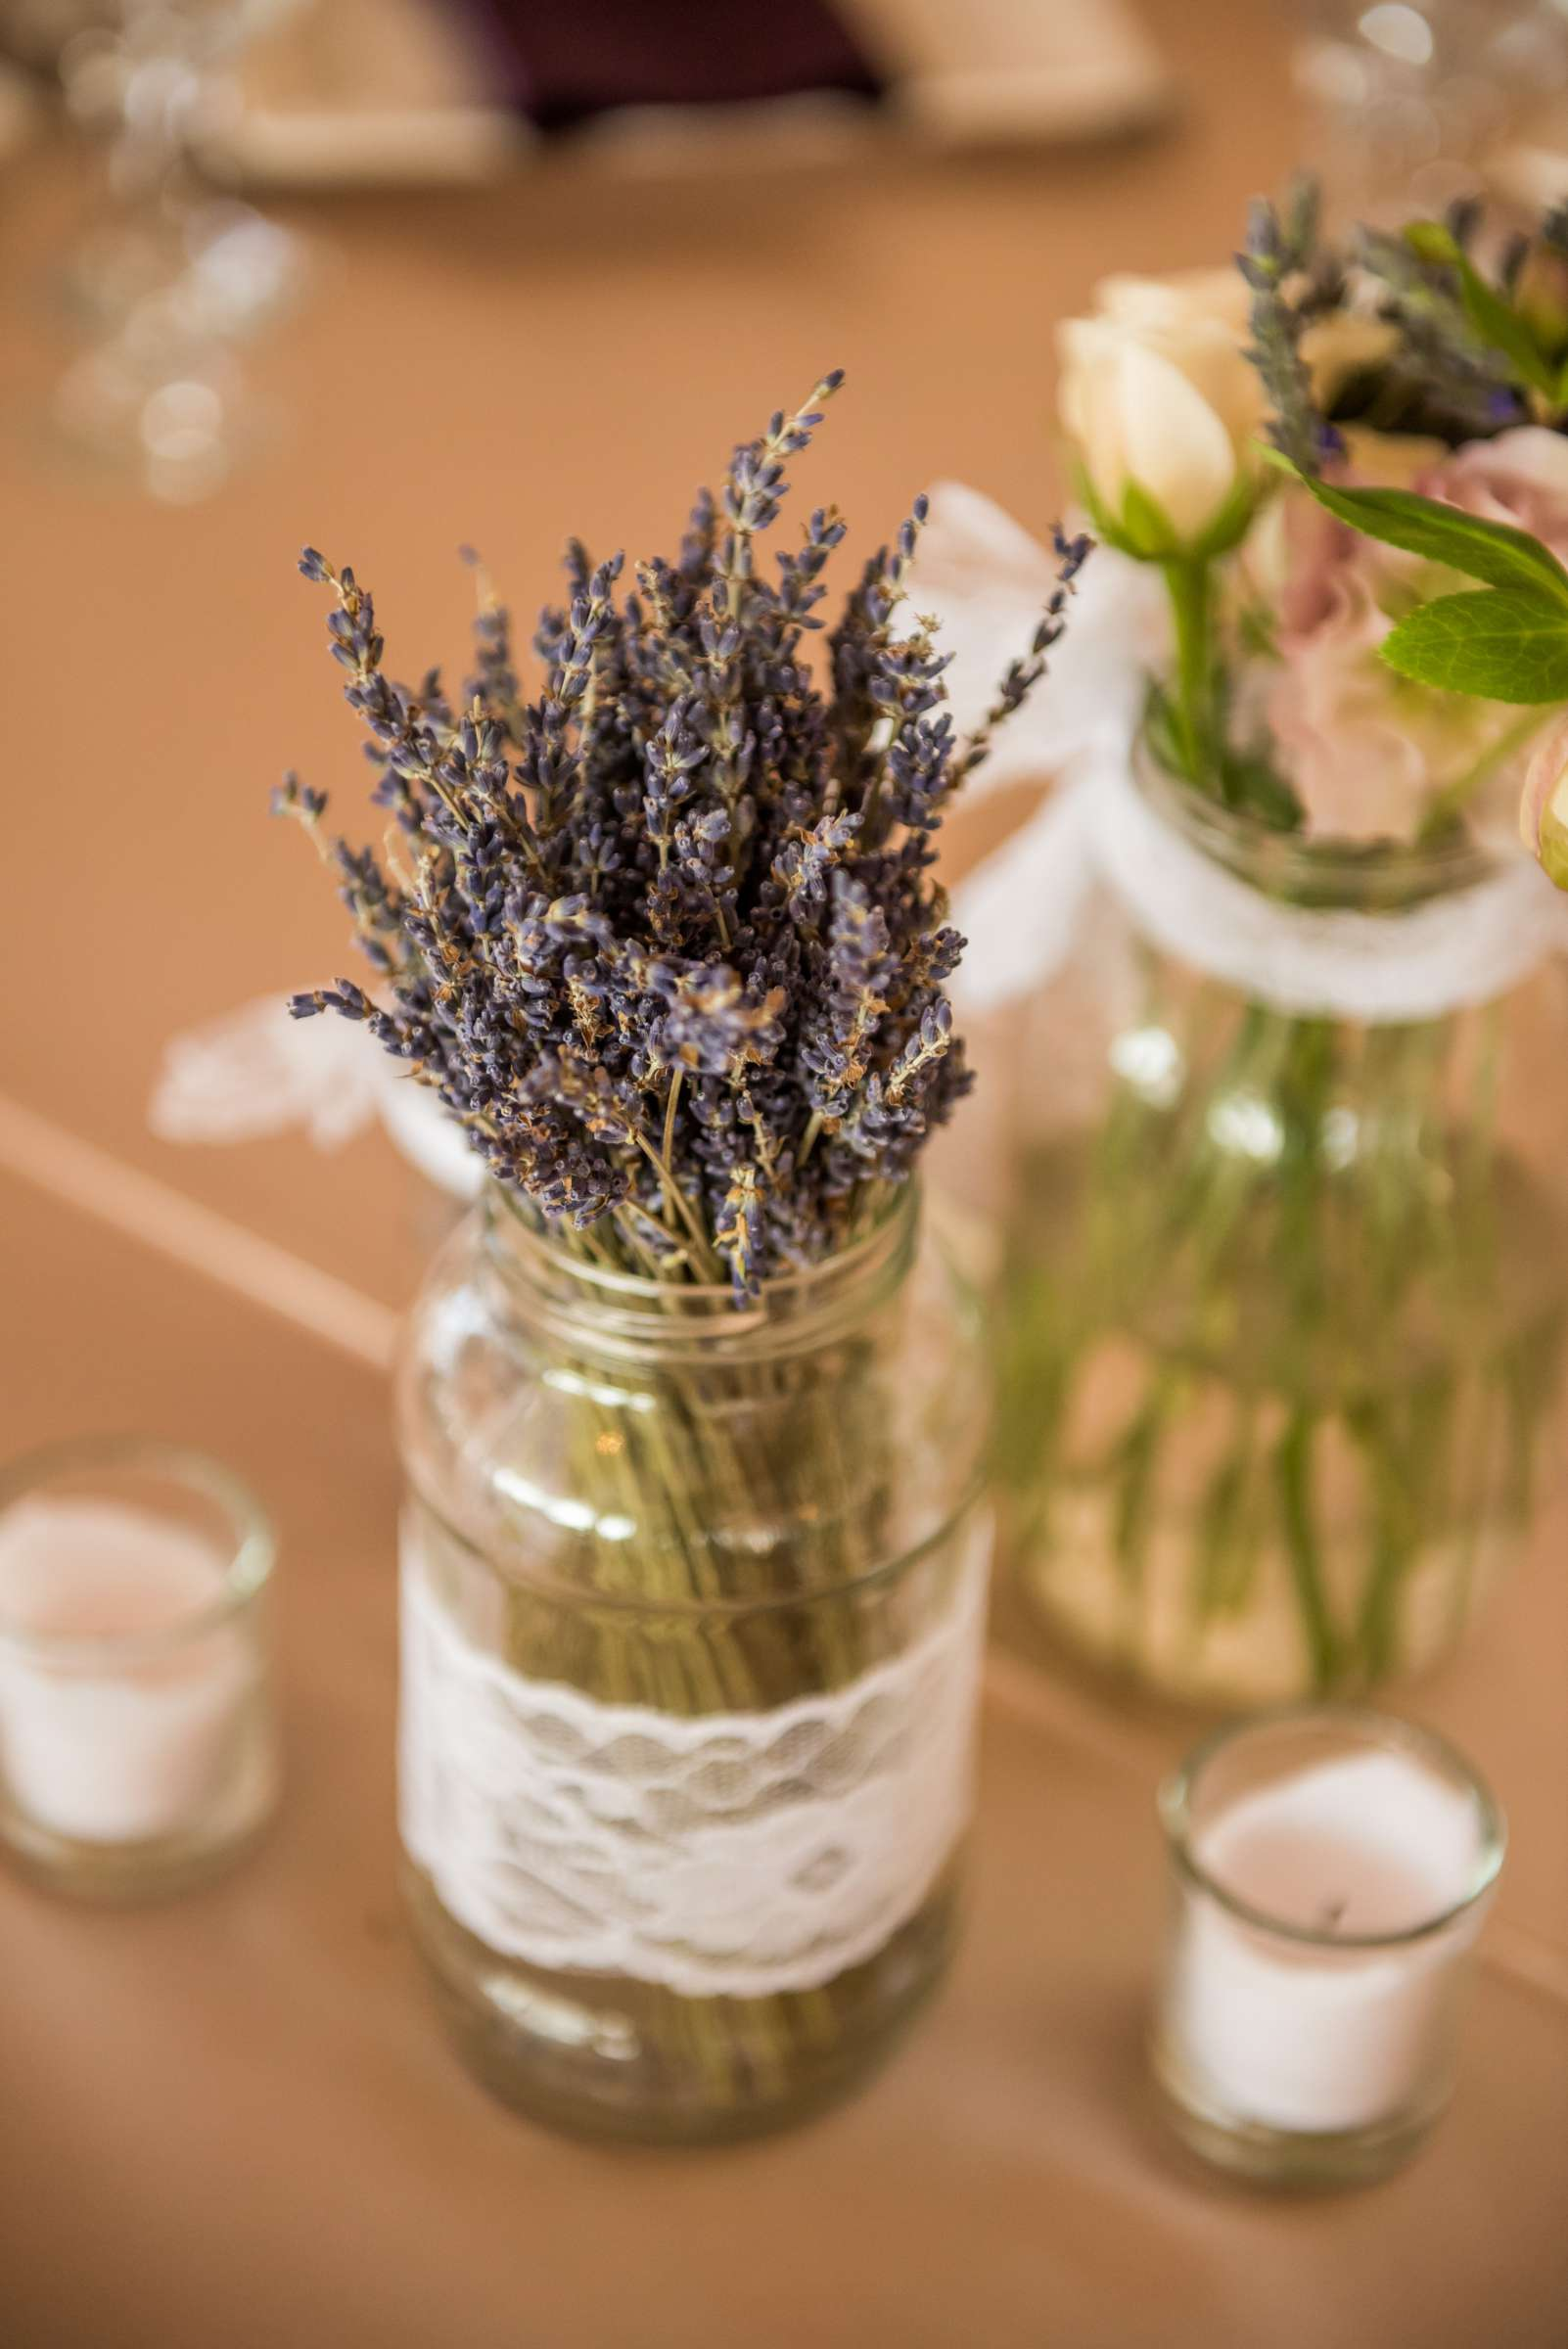 Breezy Day Weddings | San Diego Photographer - True Photography